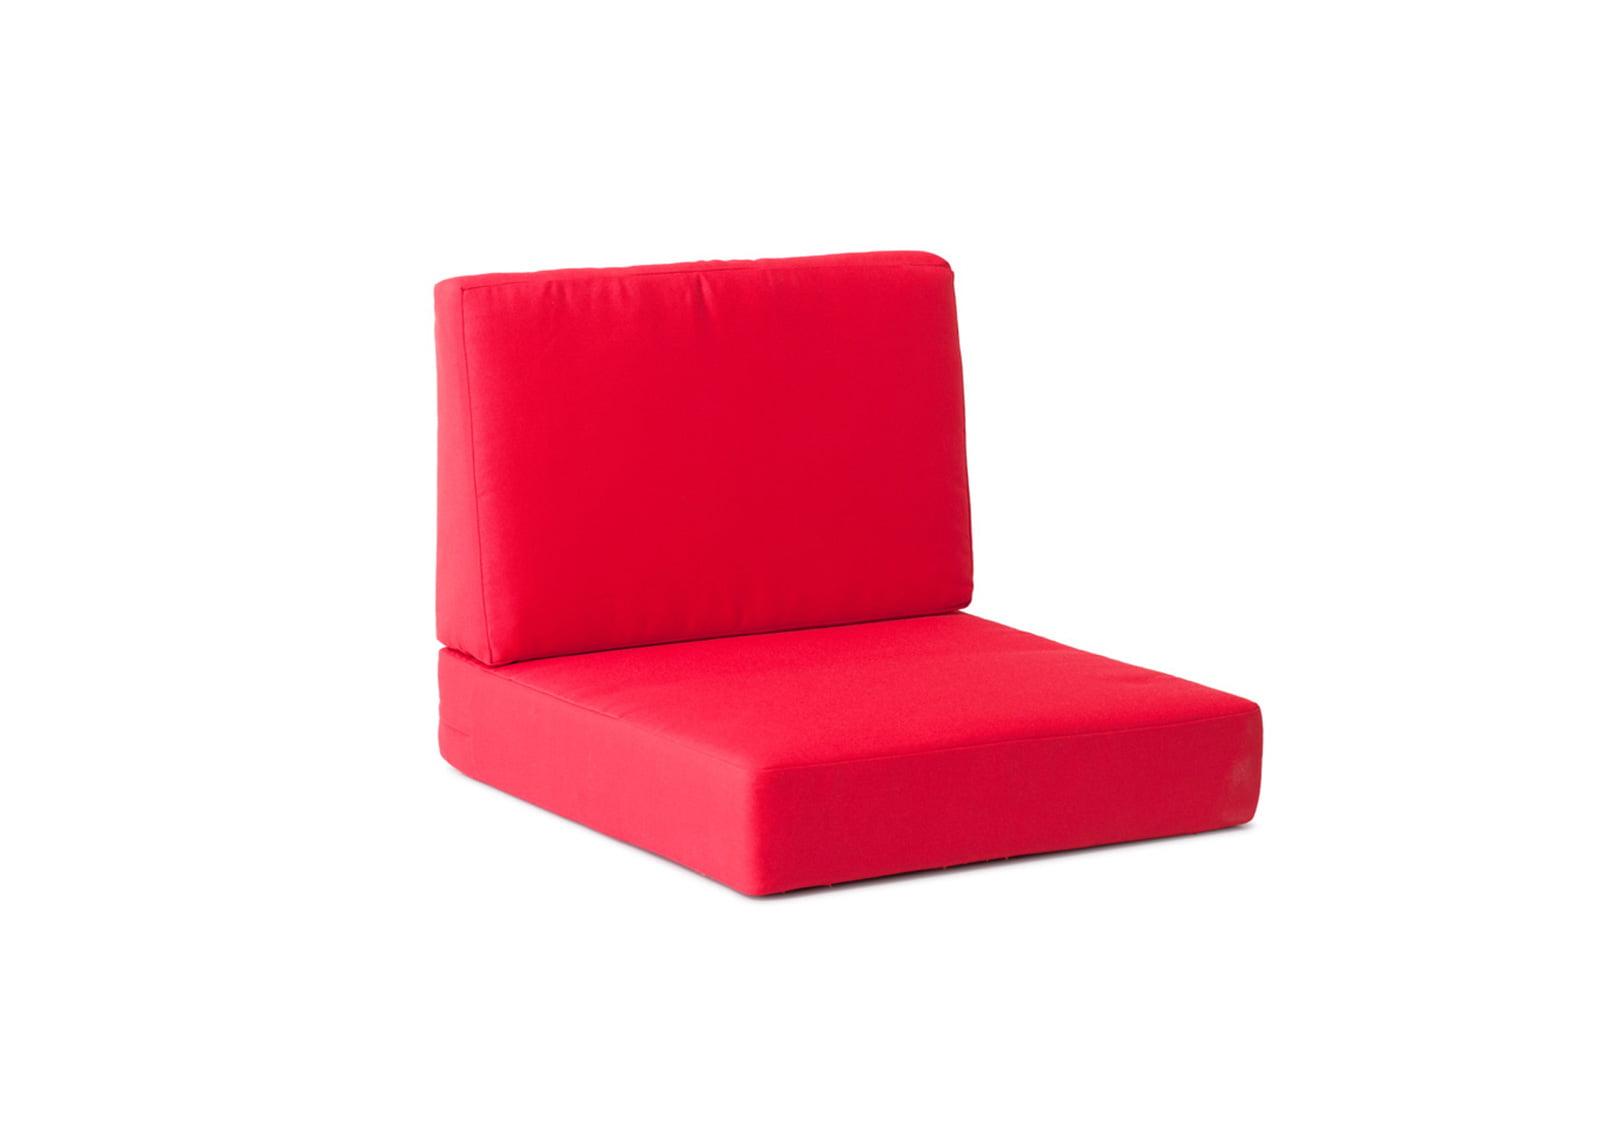 Cosmopolitan Arm Chair Cushions Red Furnishplus